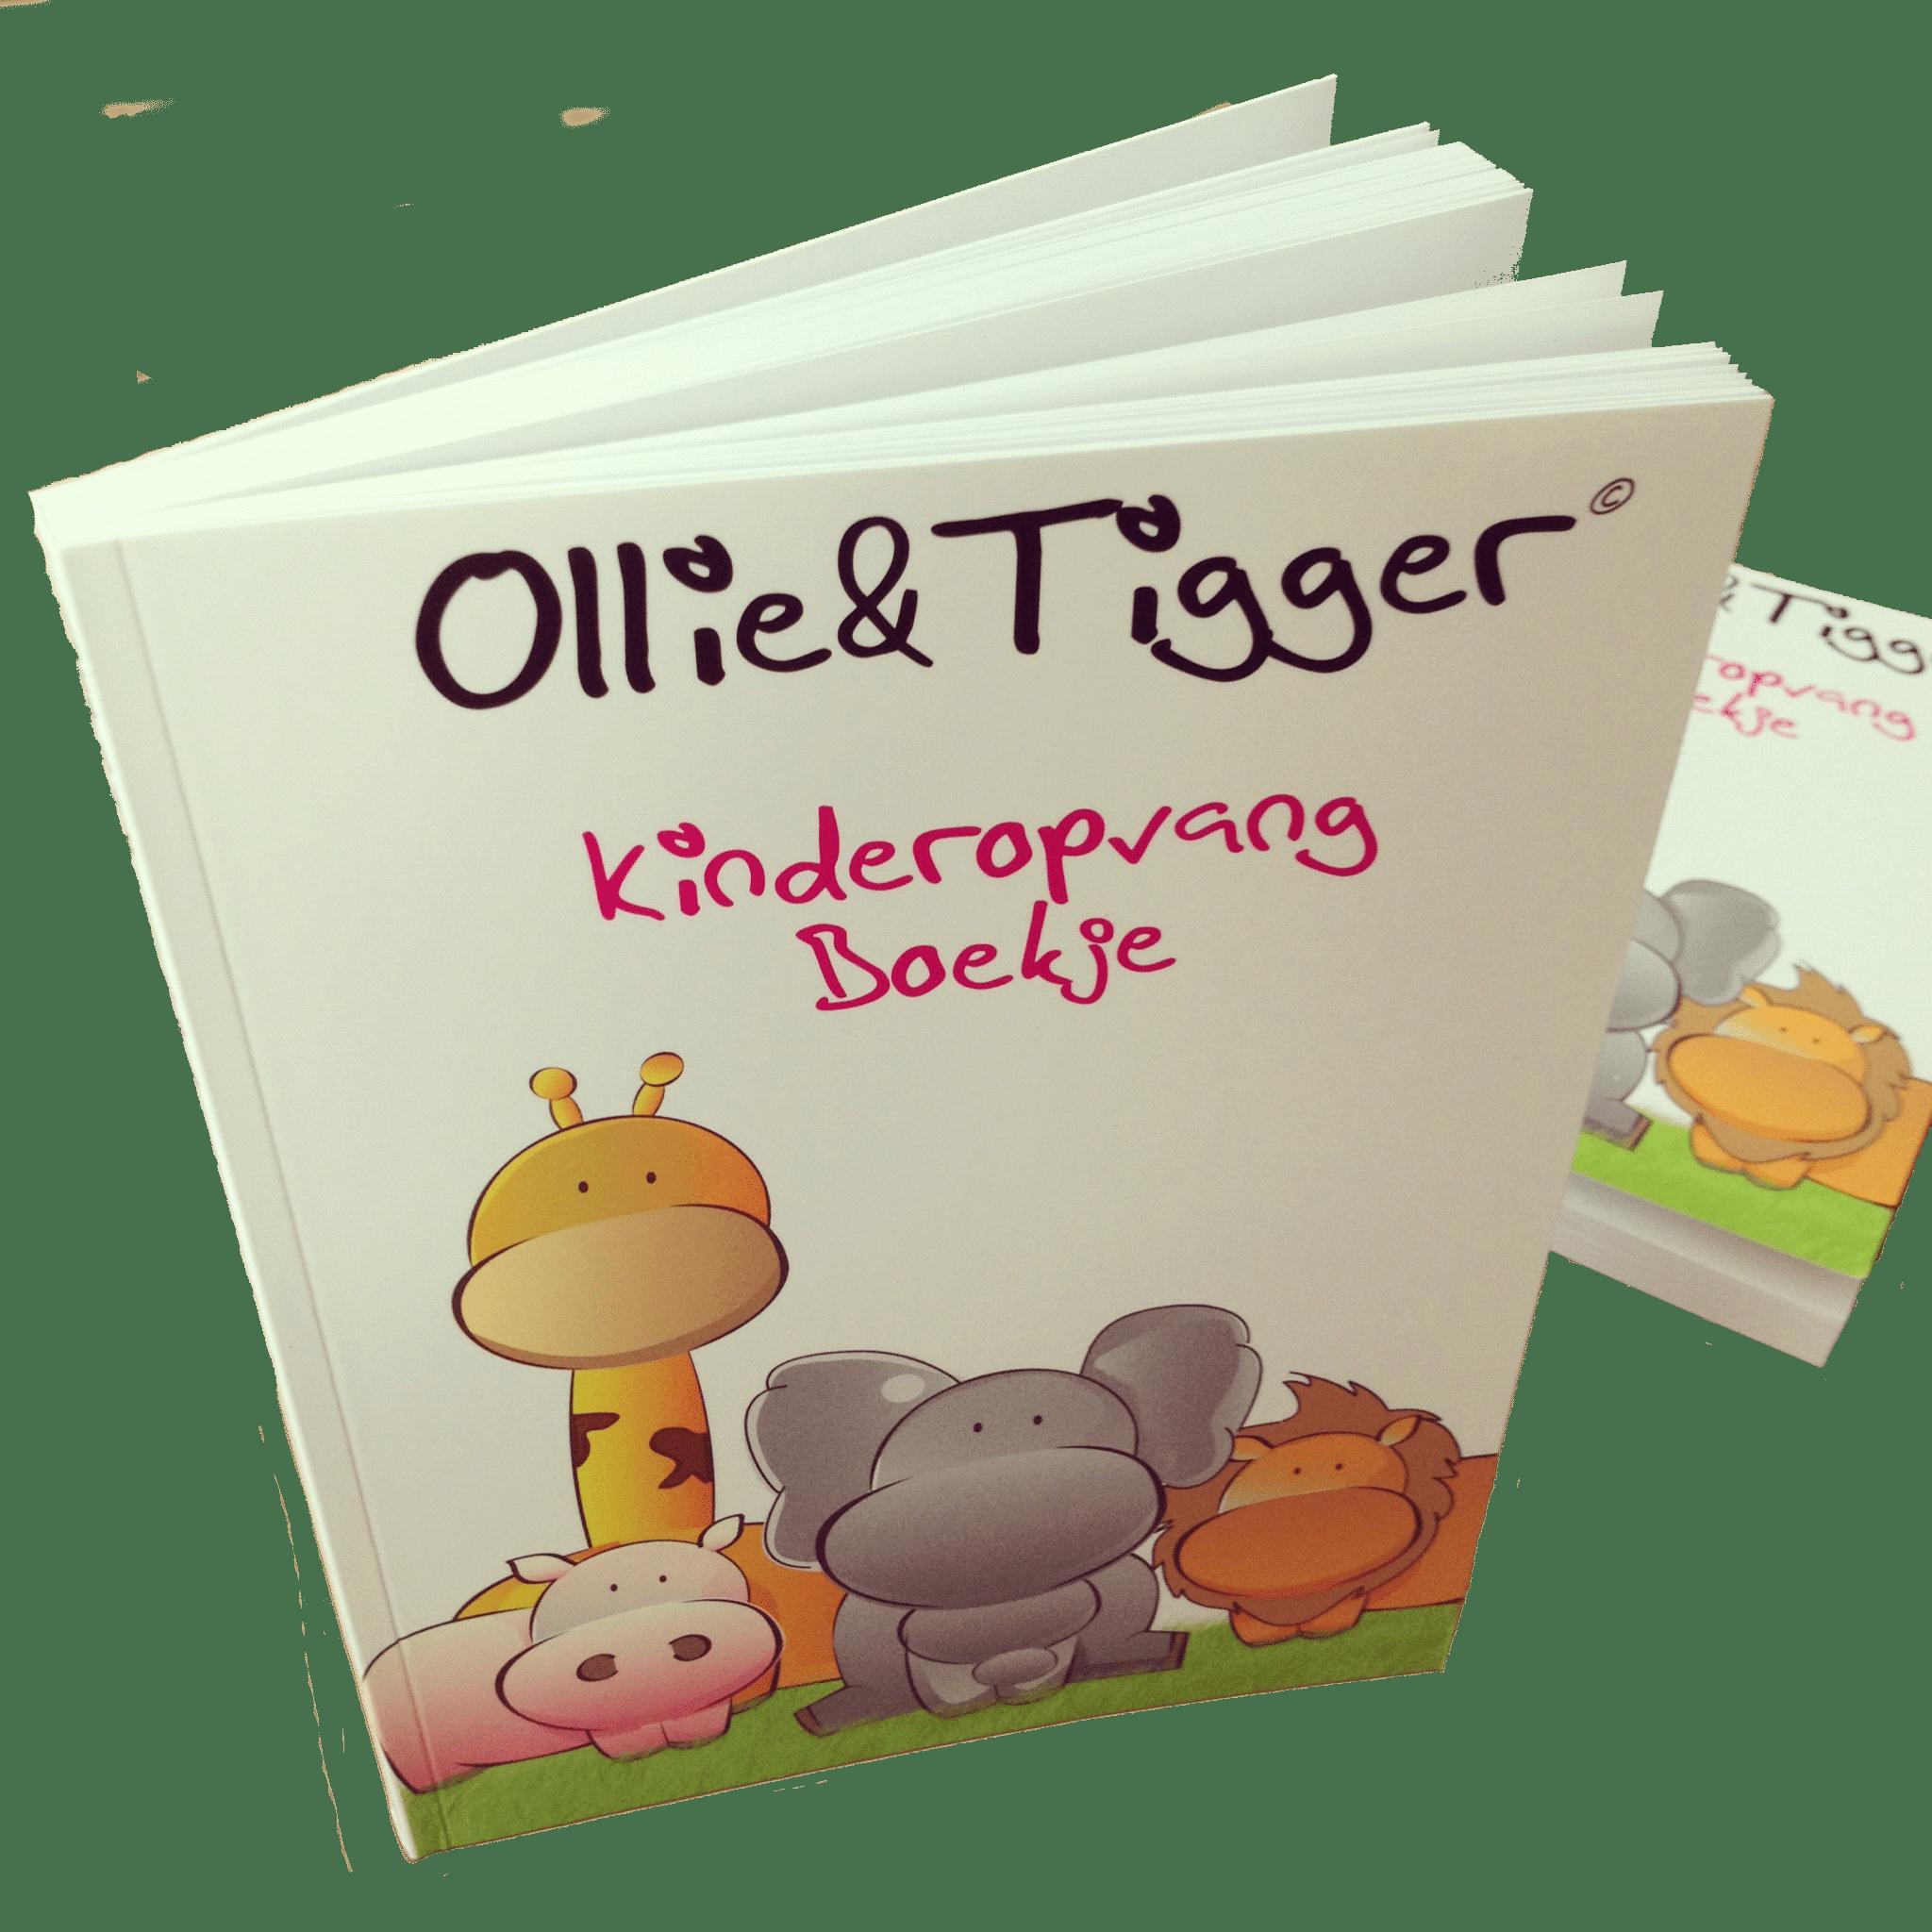 Ollie en Tigger Kinderdagverblijfboekje